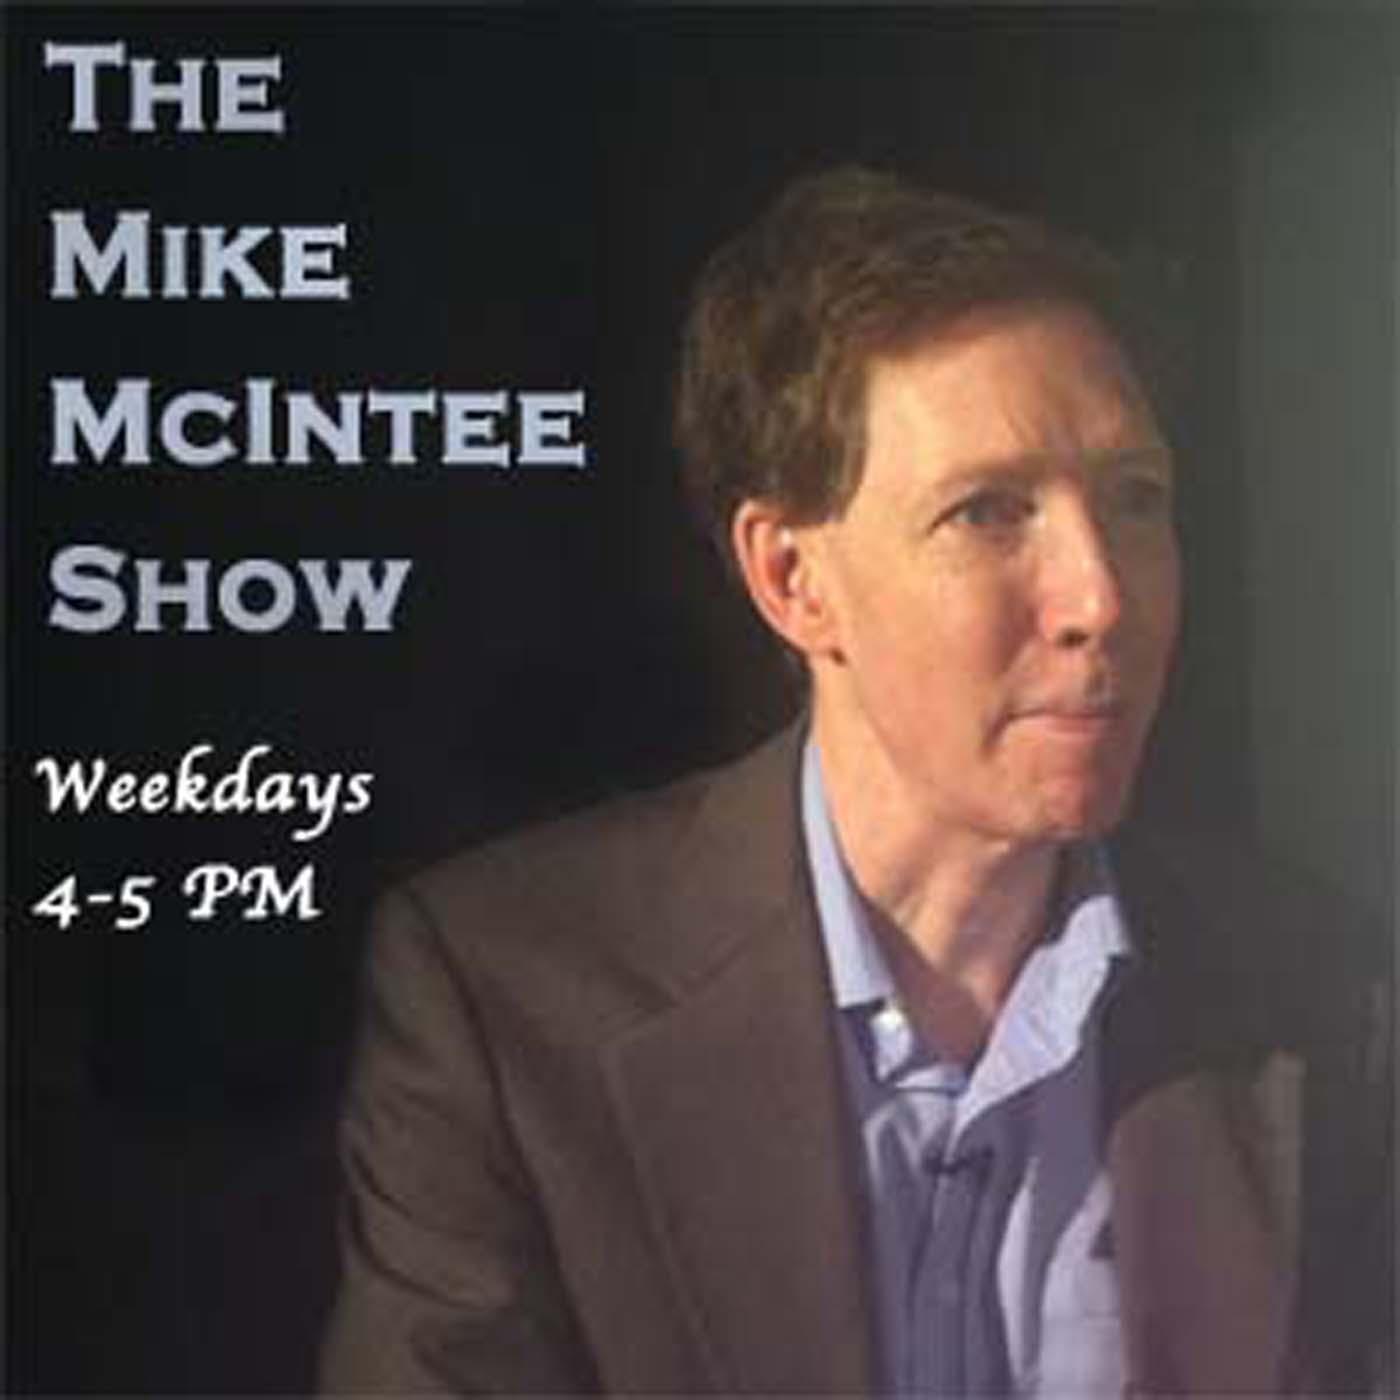 The Mike McIntee Show - AM950 The Progressive Voice of Minnesota